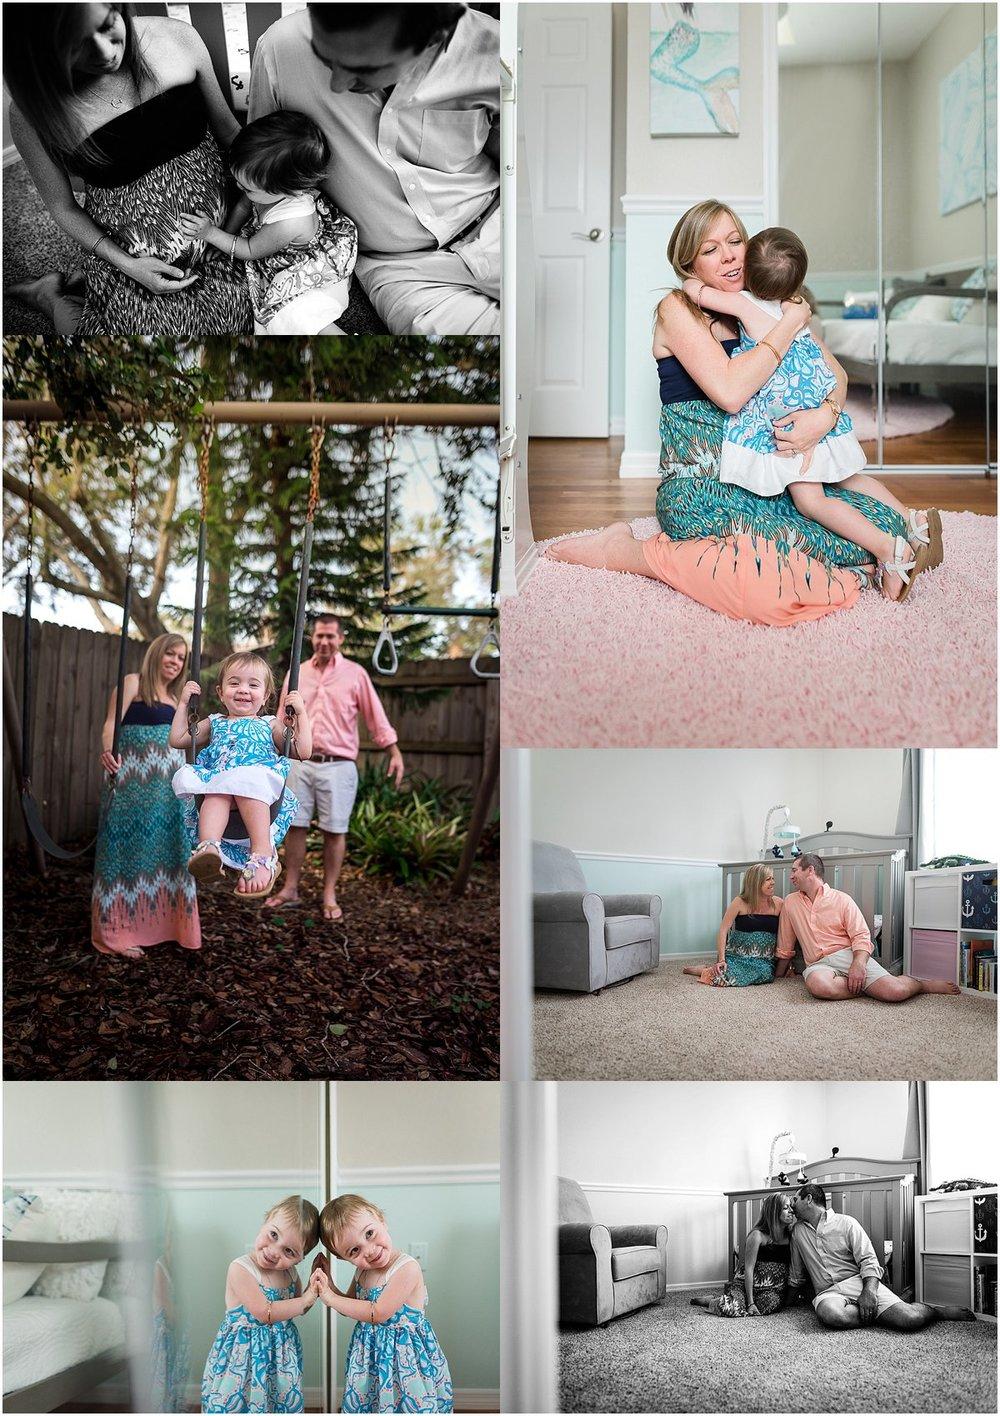 Orlando family photographer | Maternity in-home photo shoot